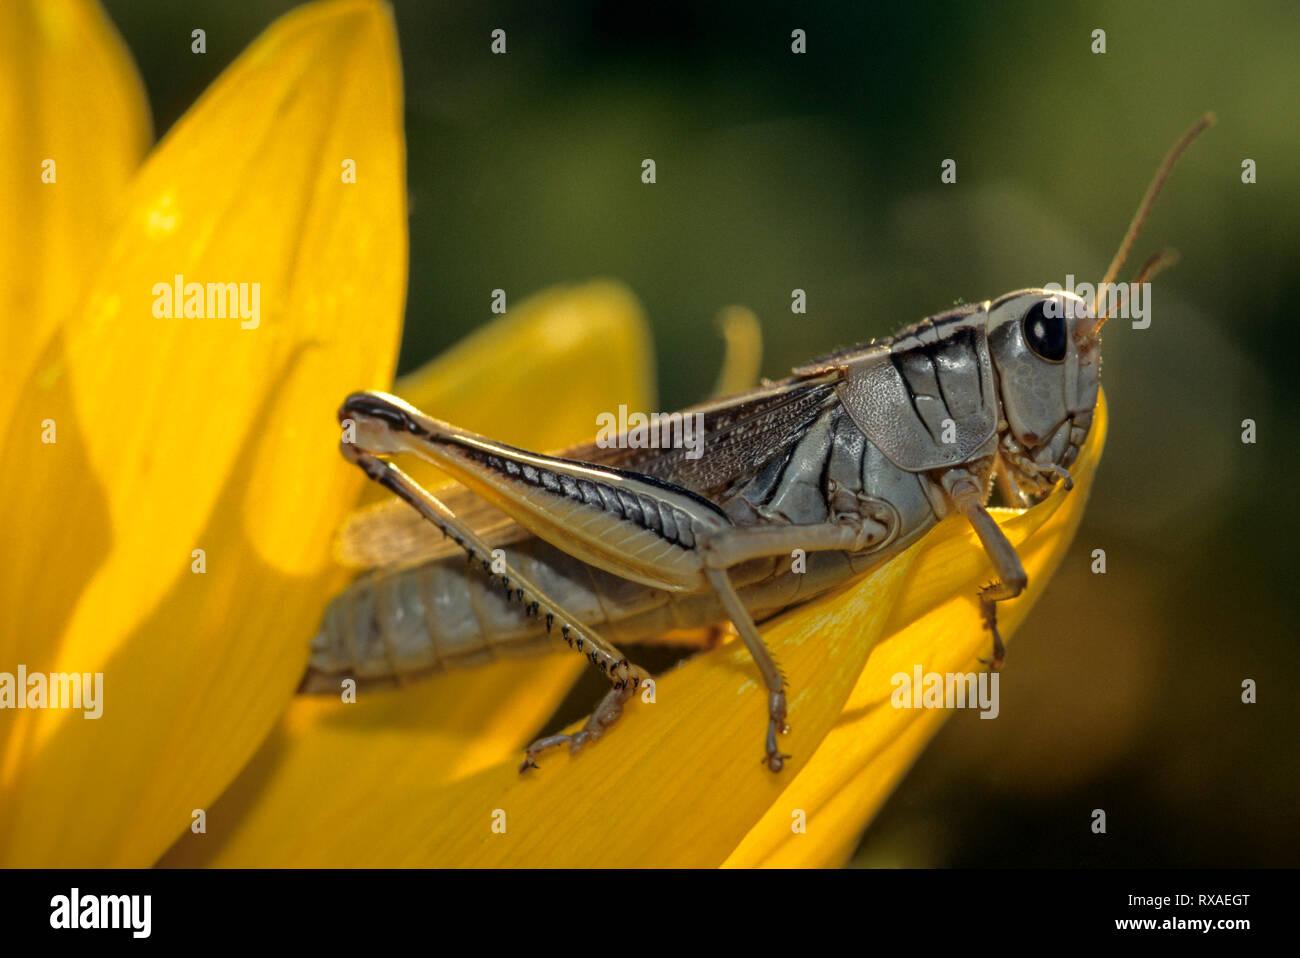 Grasshopper, Melanoplus sp., on oilseed sunflower blossom, Saskatchewan, Canada - Stock Image